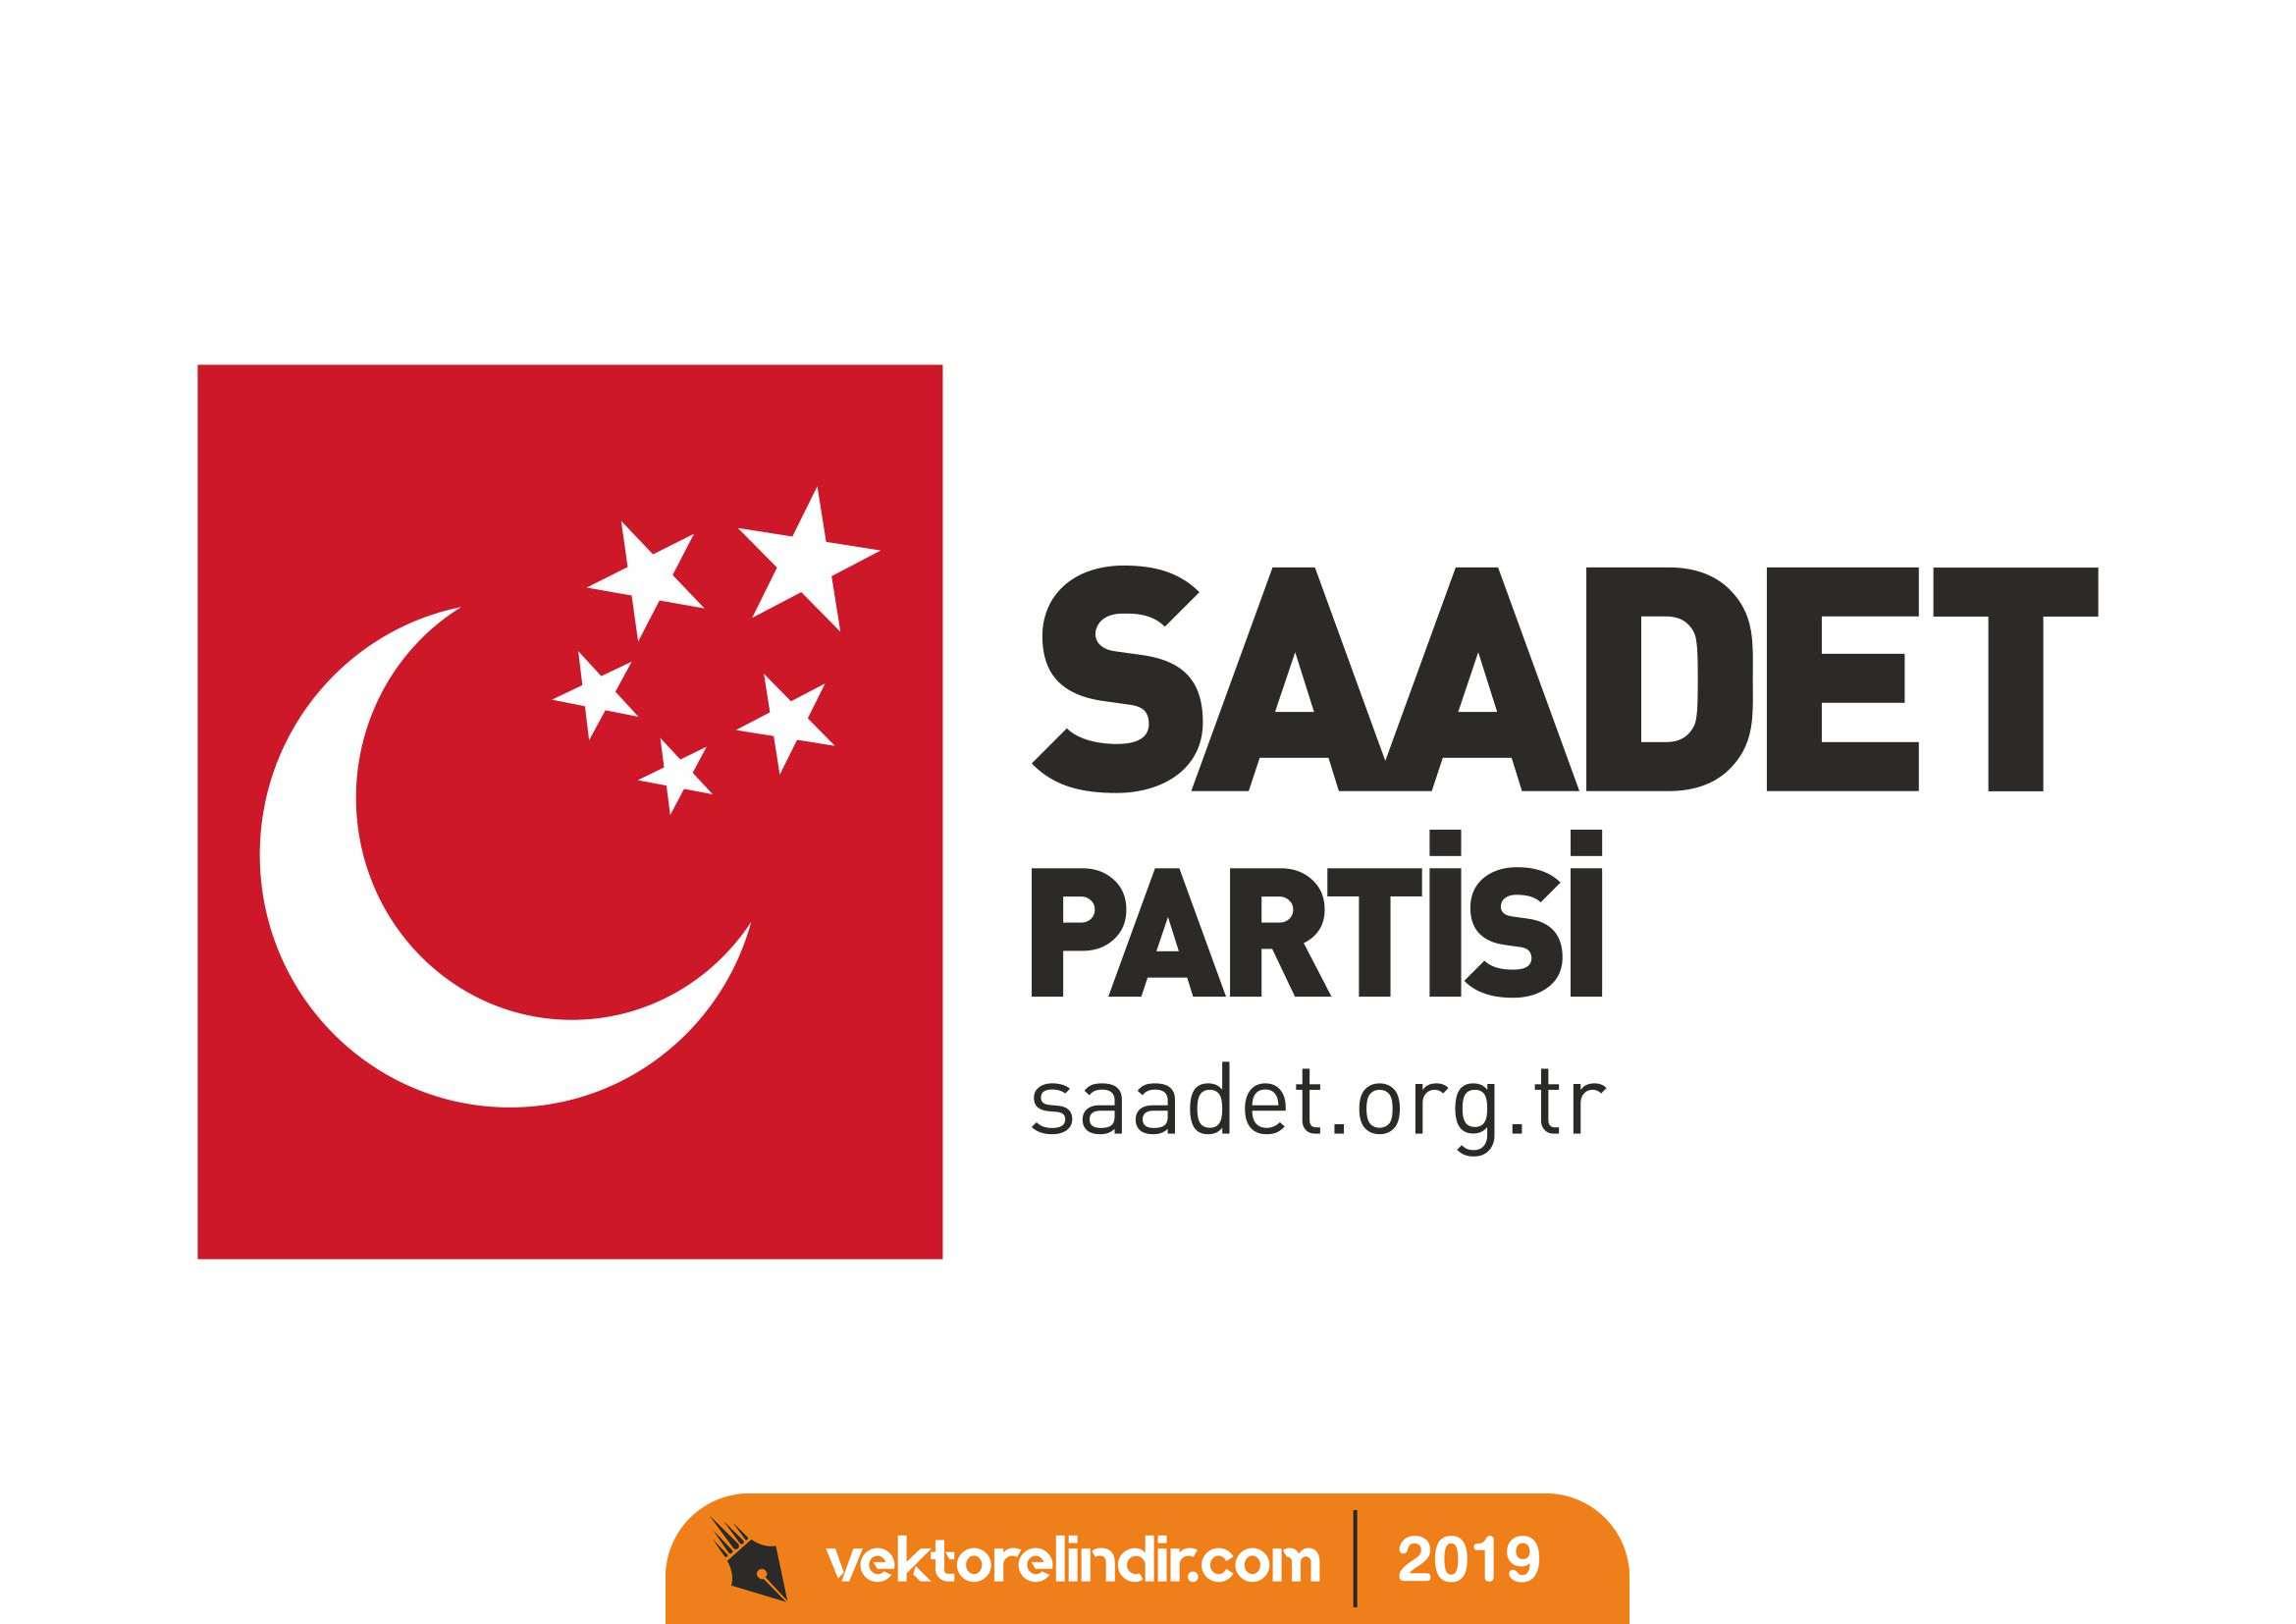 Saadet Partisi Logo, Amblem